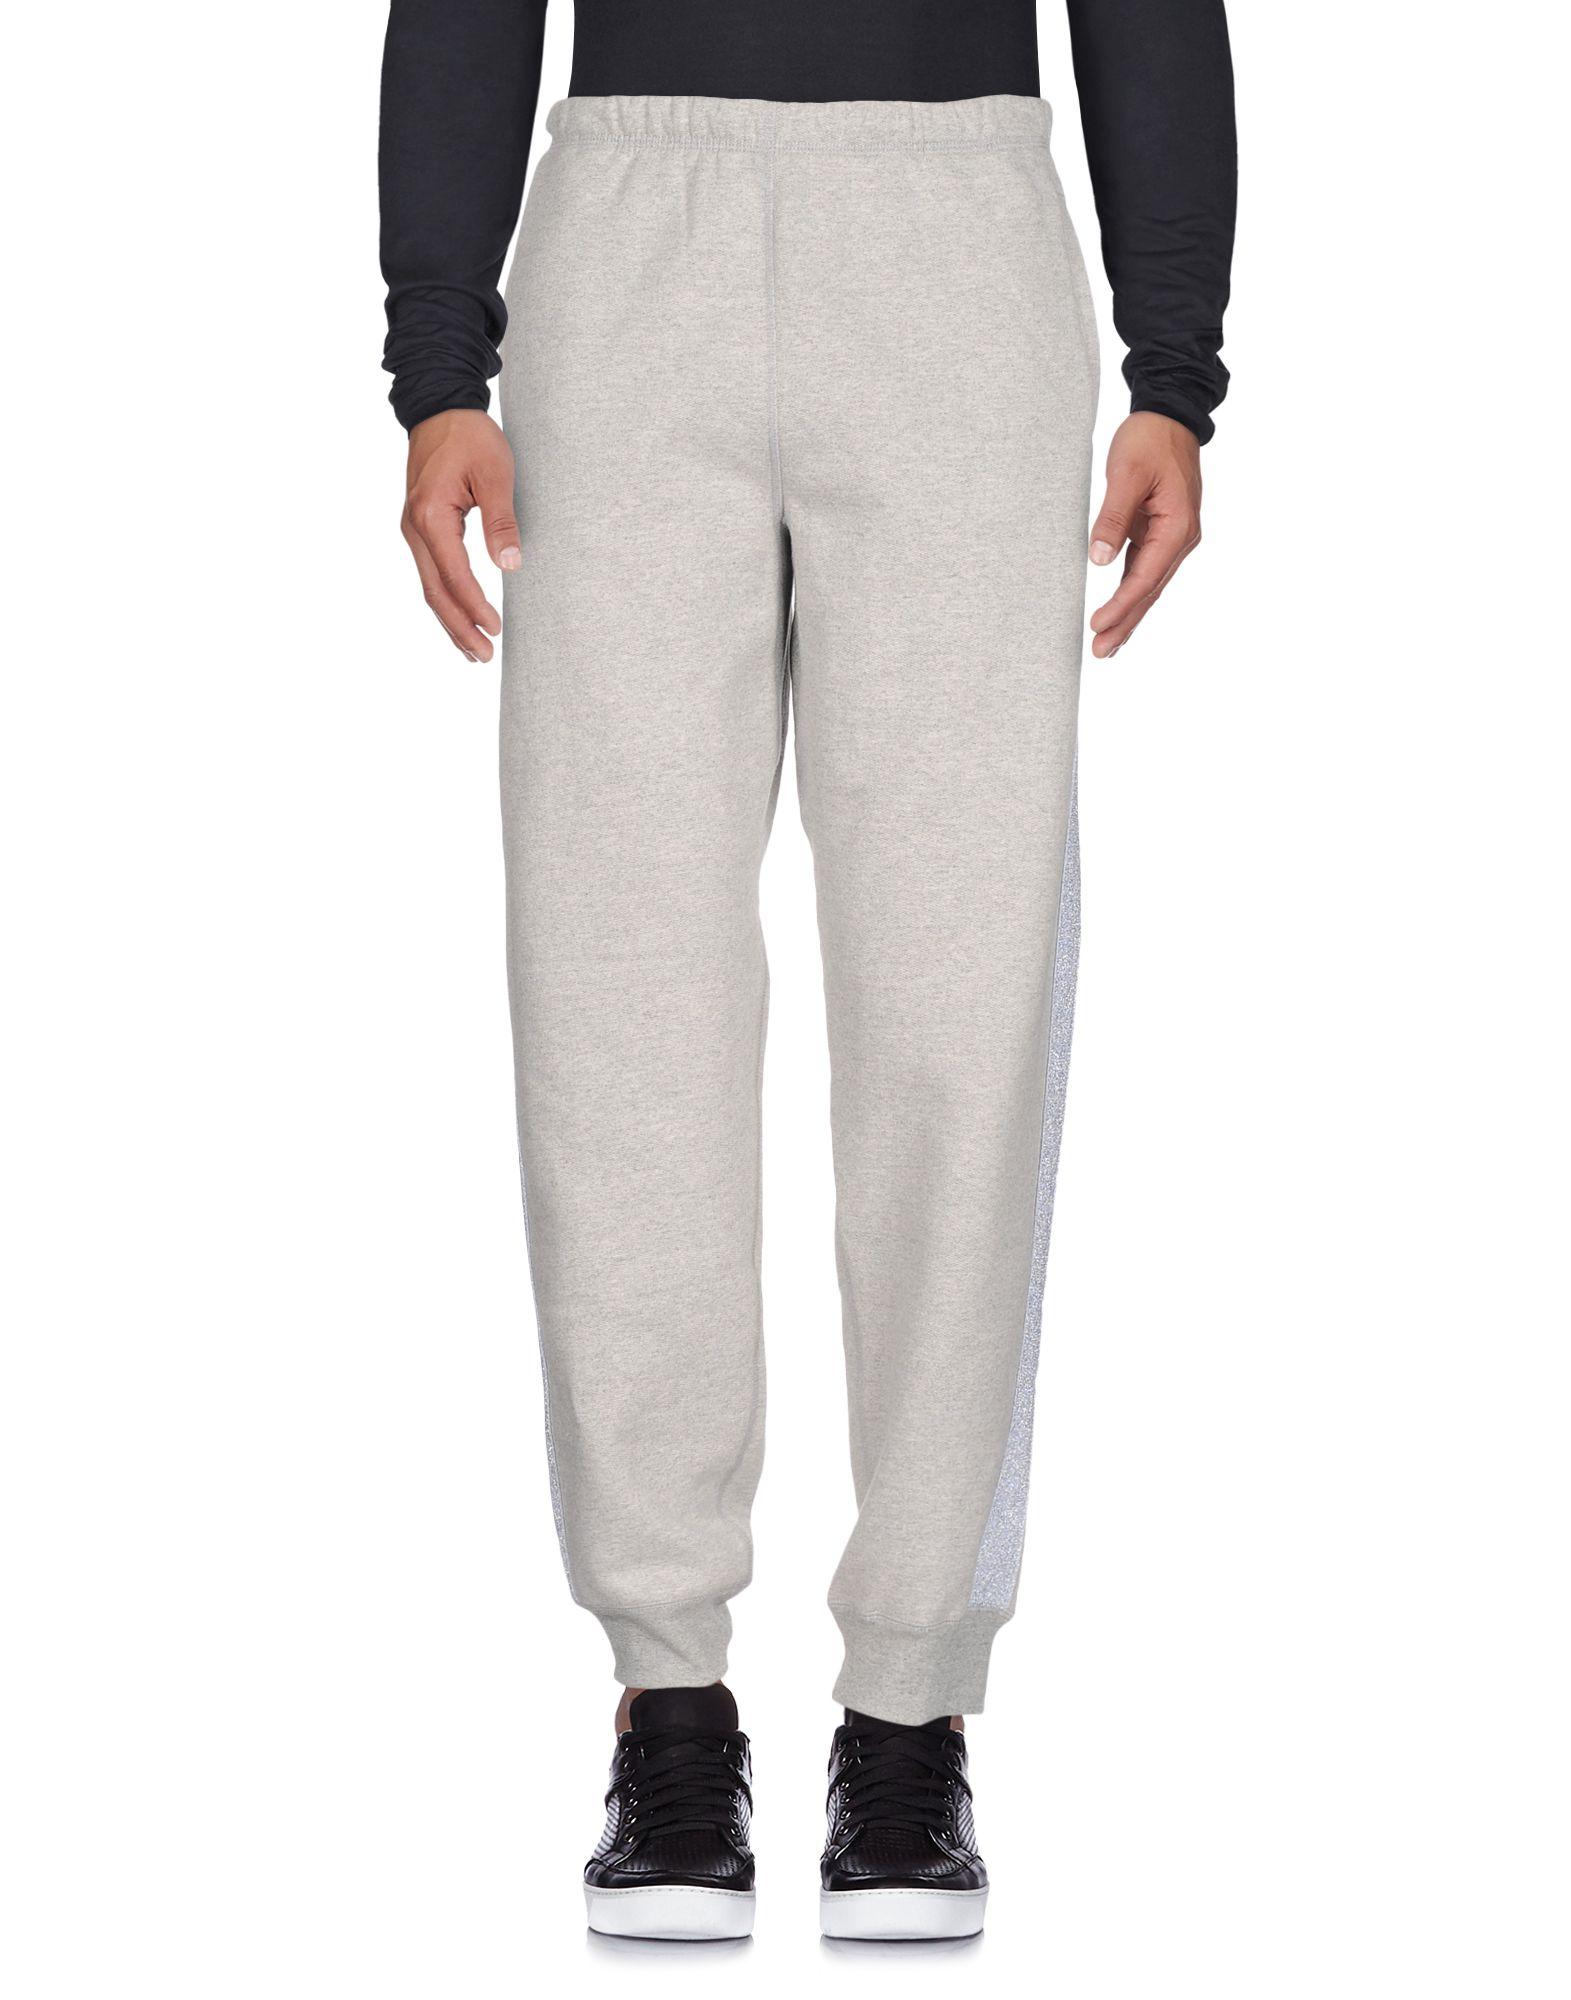 Pantalone Engineered Garments Donna - Acquista online su